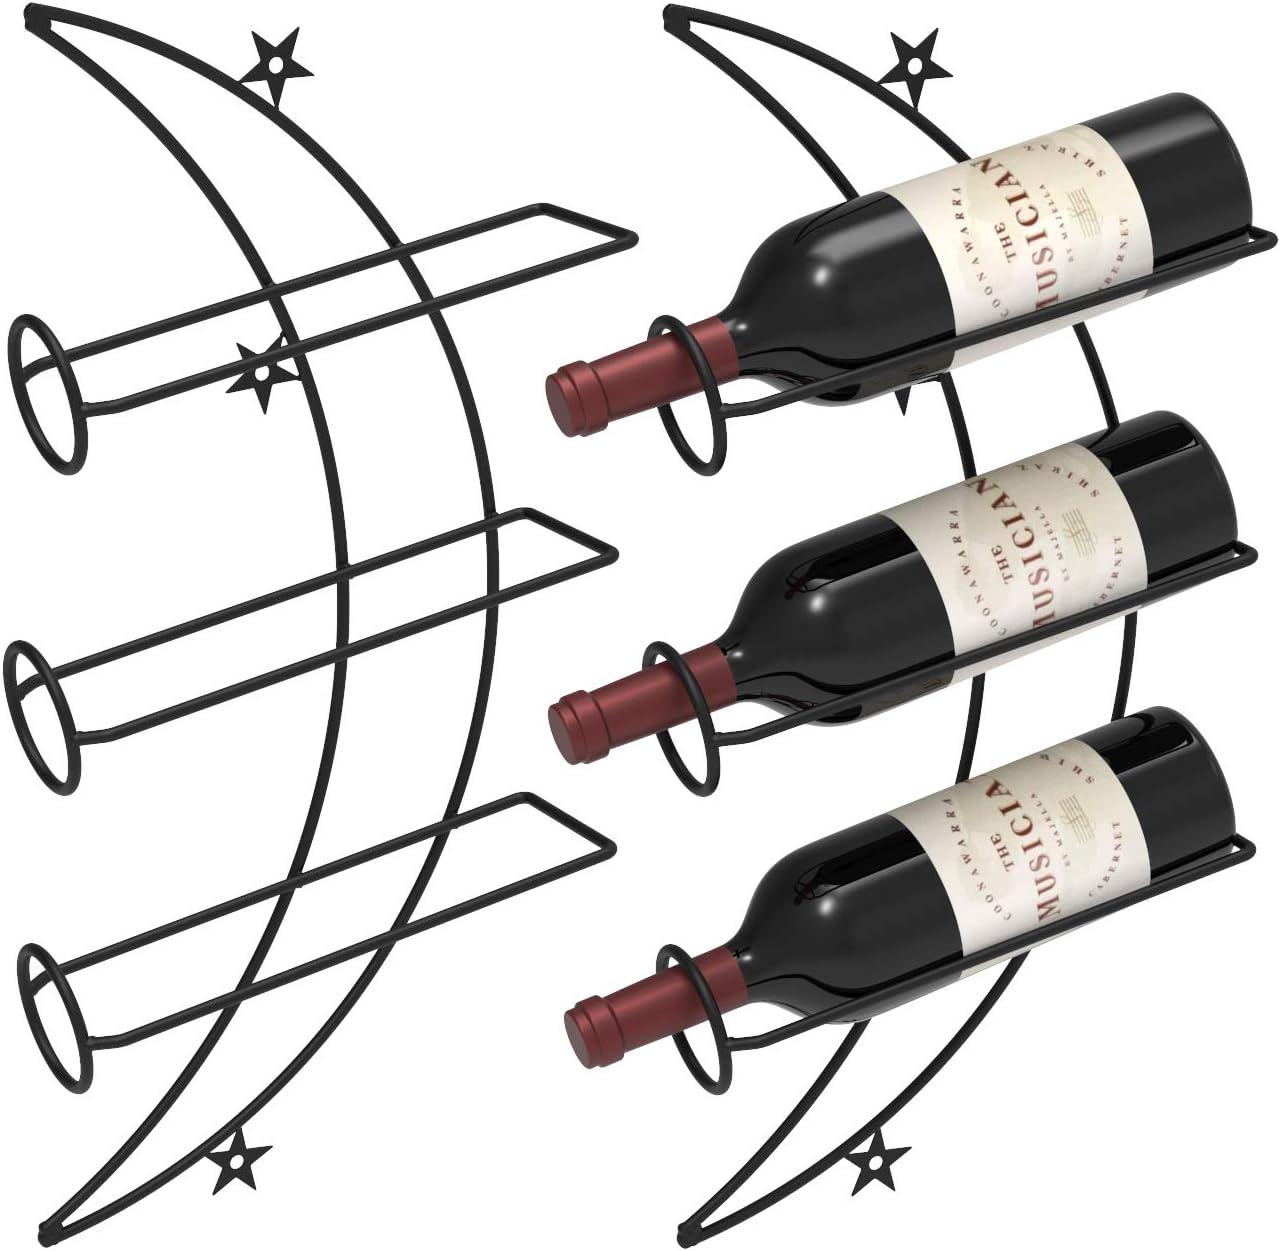 Nijoam Wall Mounted Wine Rack Bottle Discount is also underway Holder Metal 1 year warranty Decorat